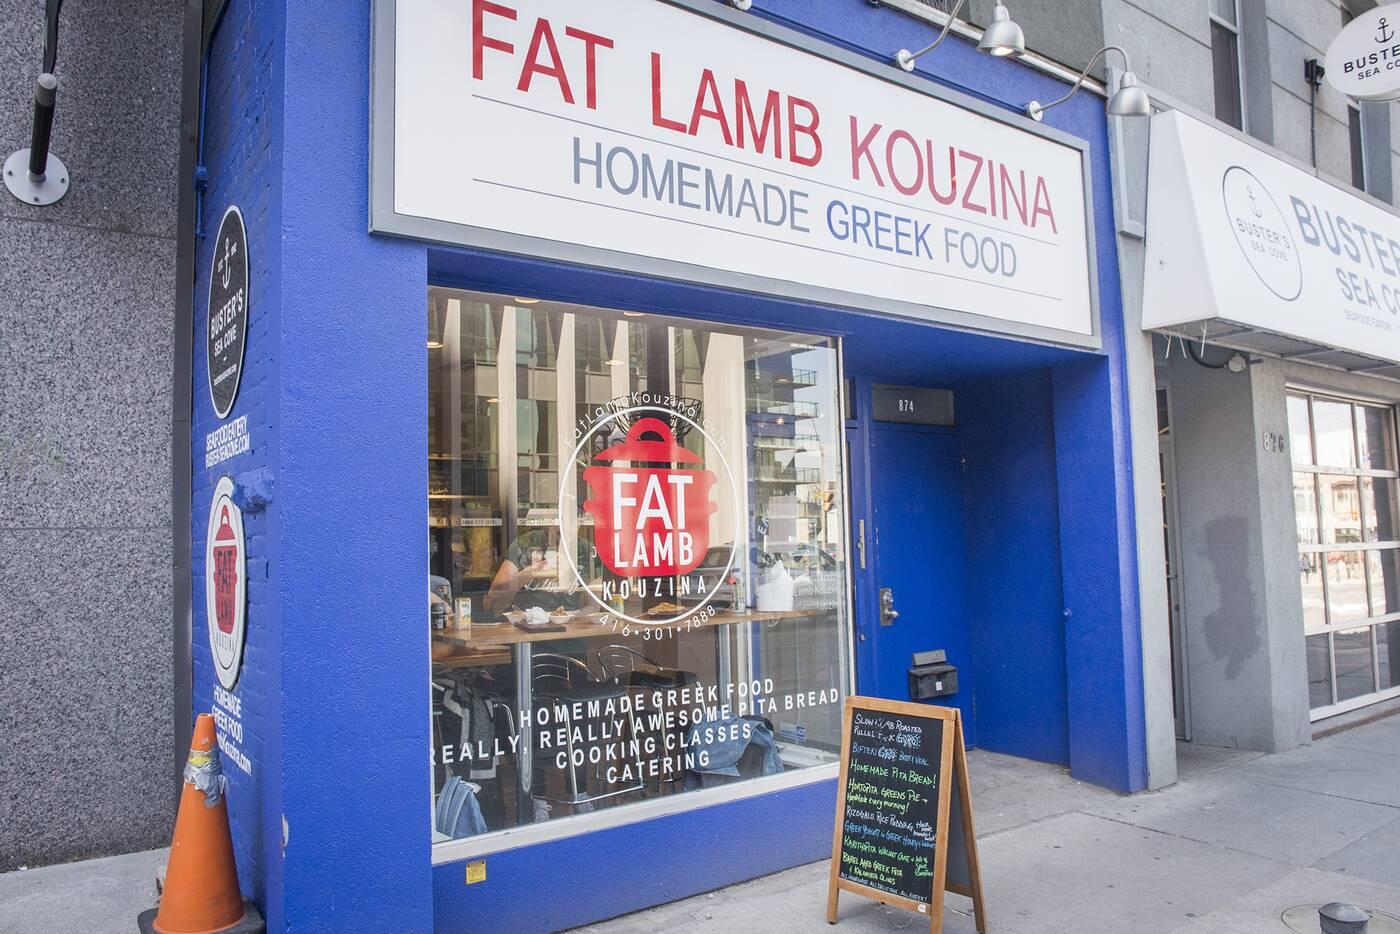 Fat Lamb Kouzina Toronto